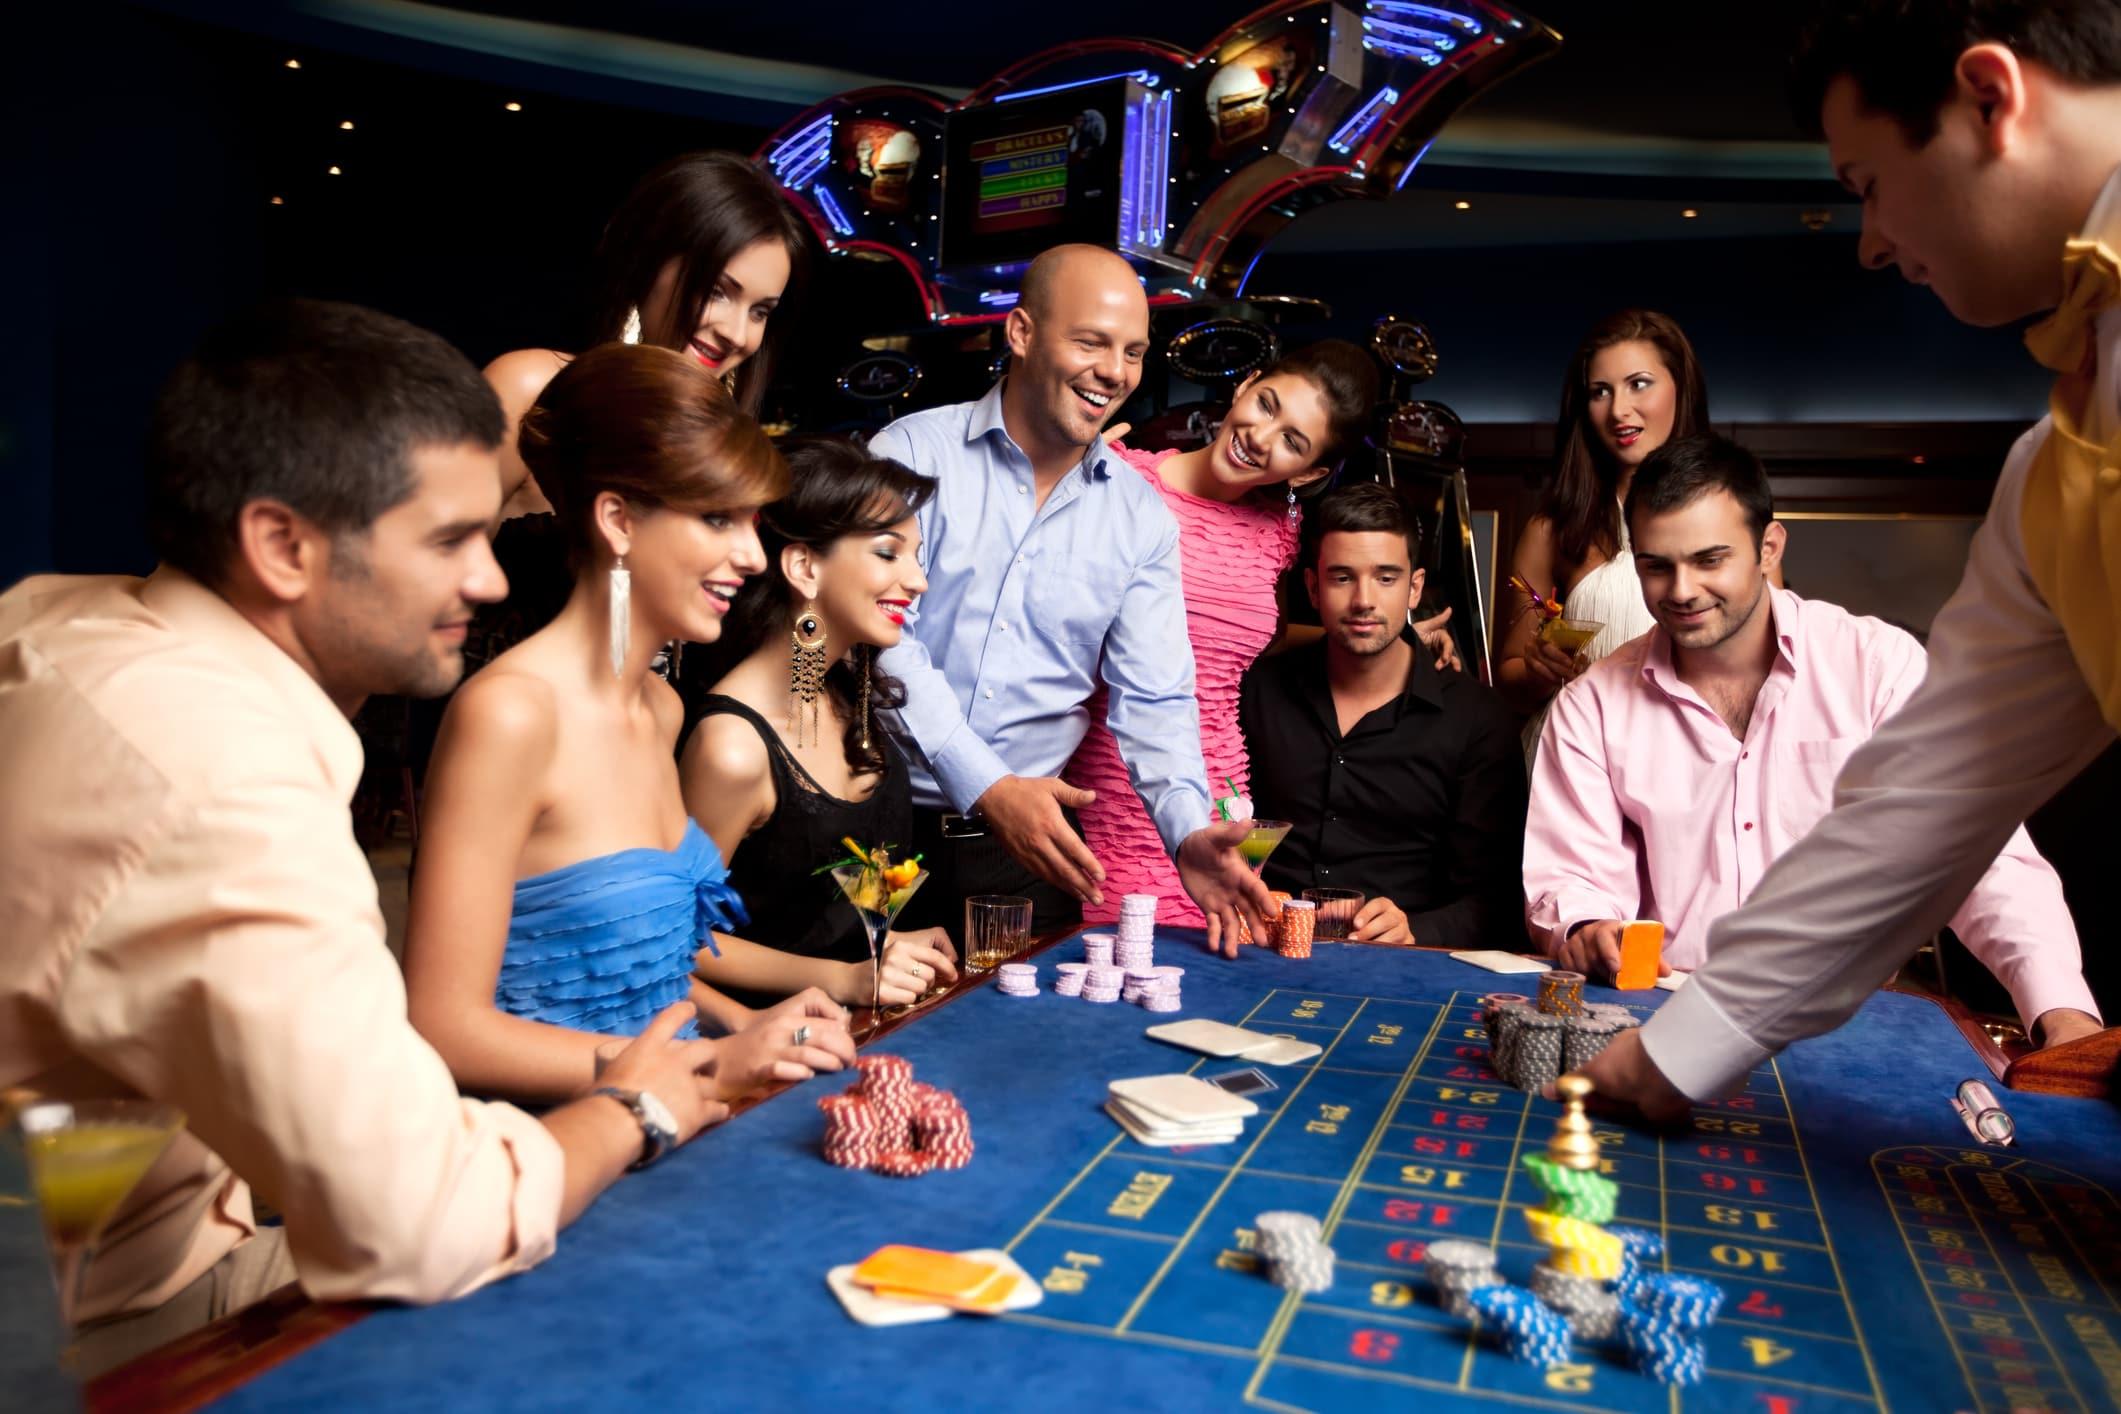 Gaming in Gambling